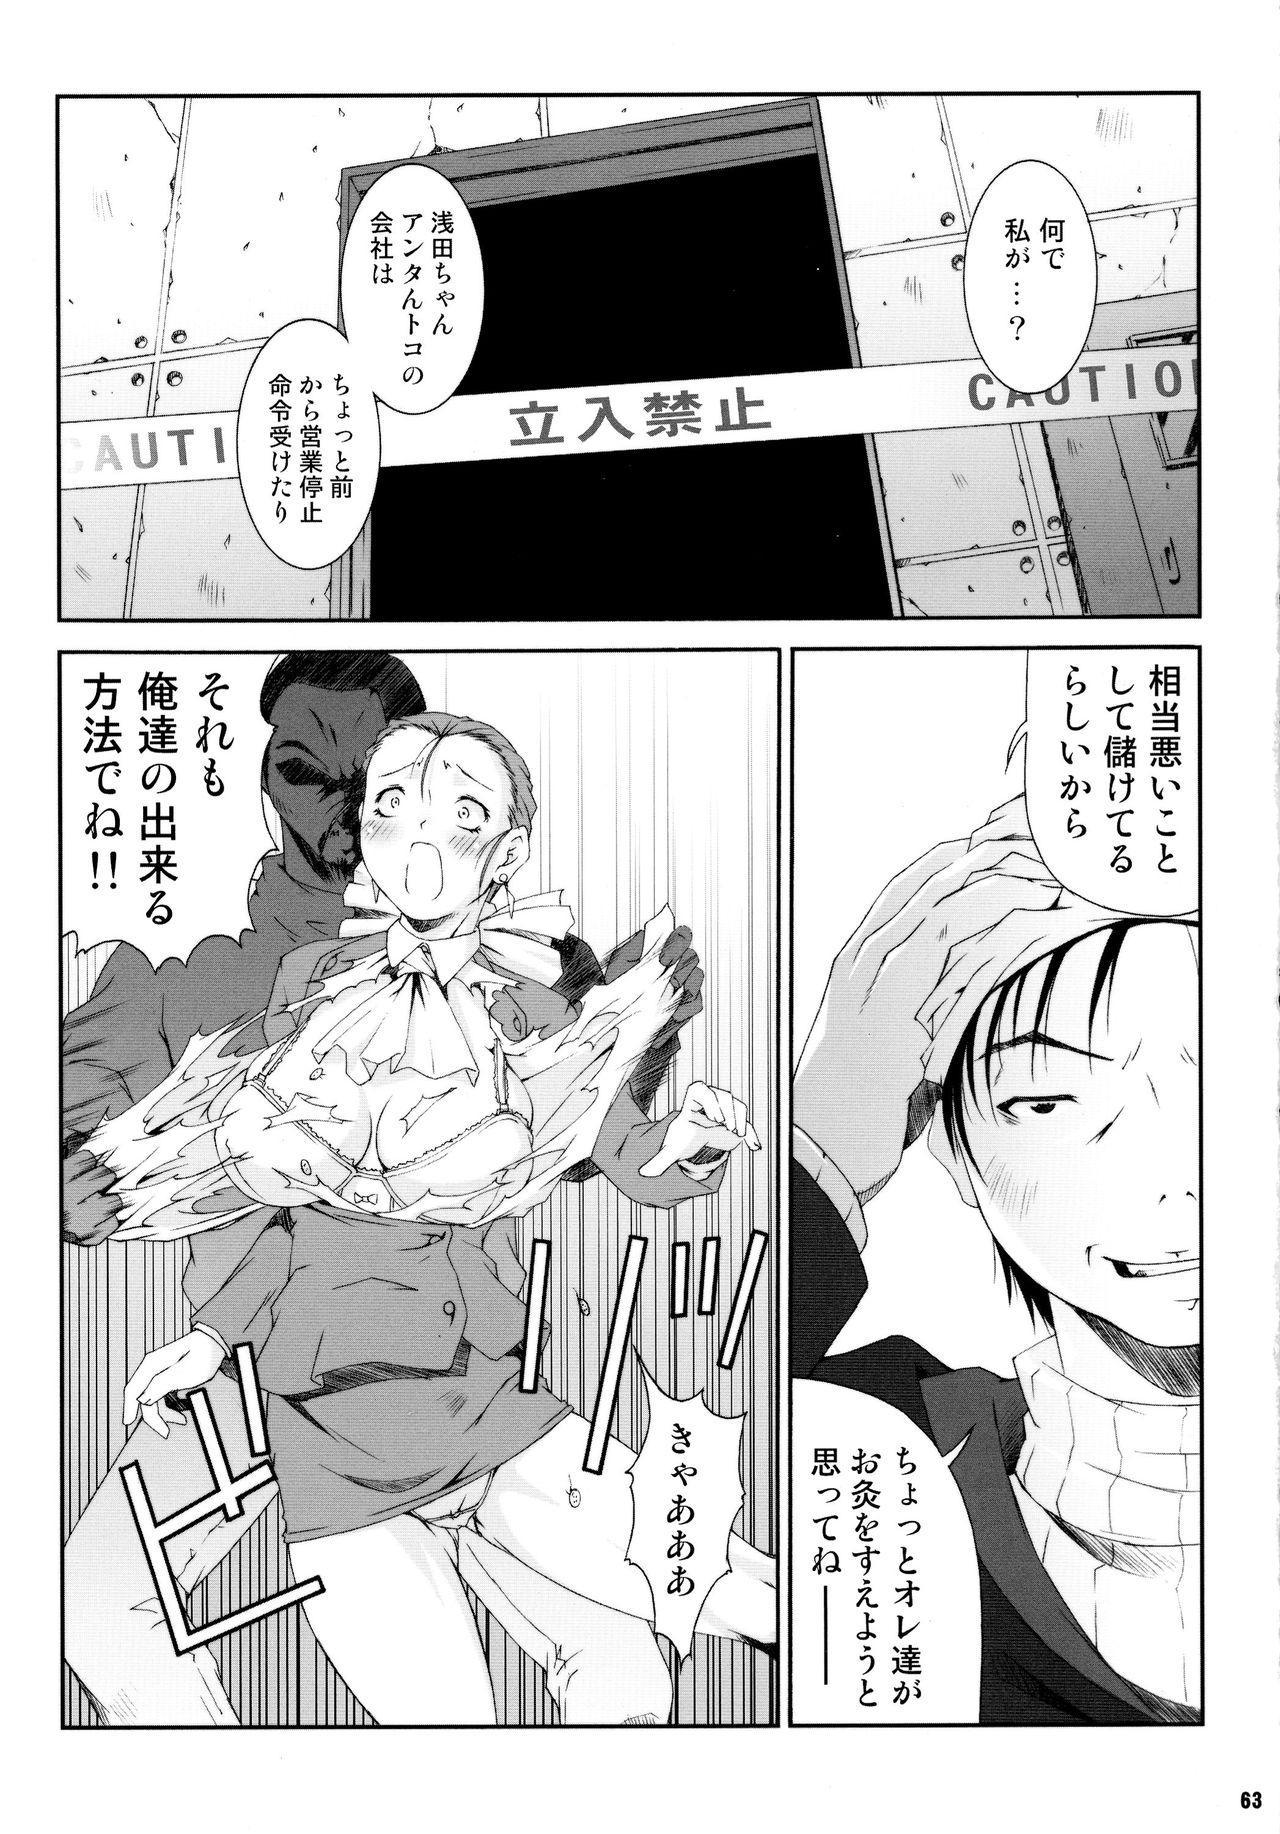 Misoka no 5 62